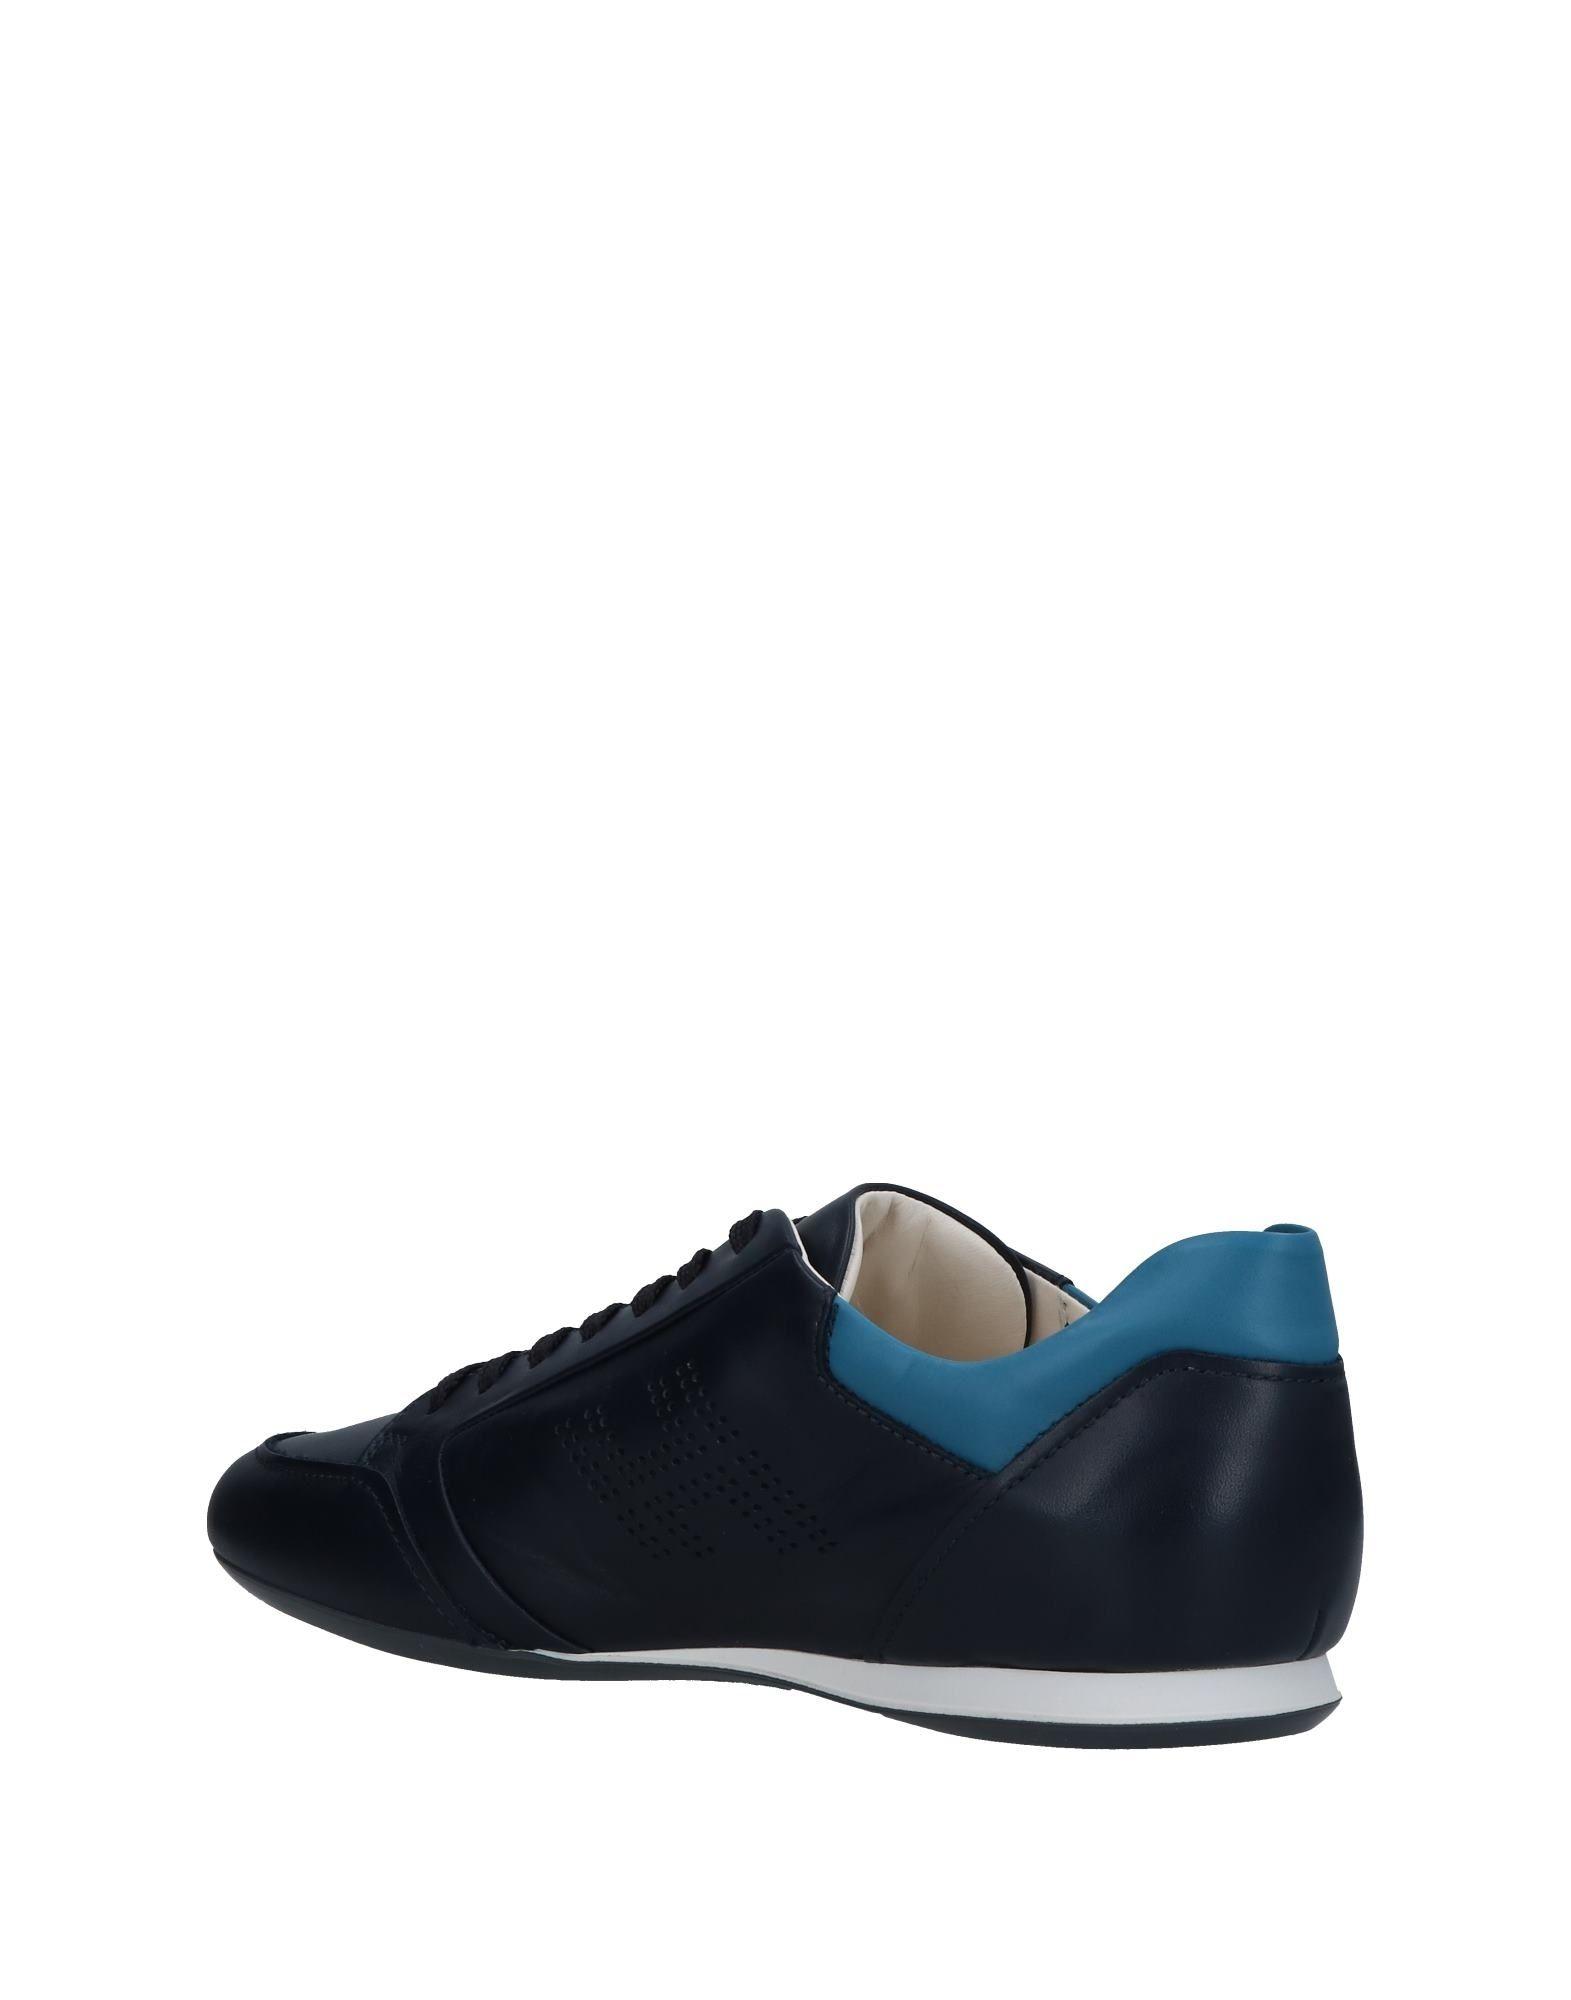 Hogan Sneakers Herren Heiße  11396914IQ Heiße Herren Schuhe 73ac9a